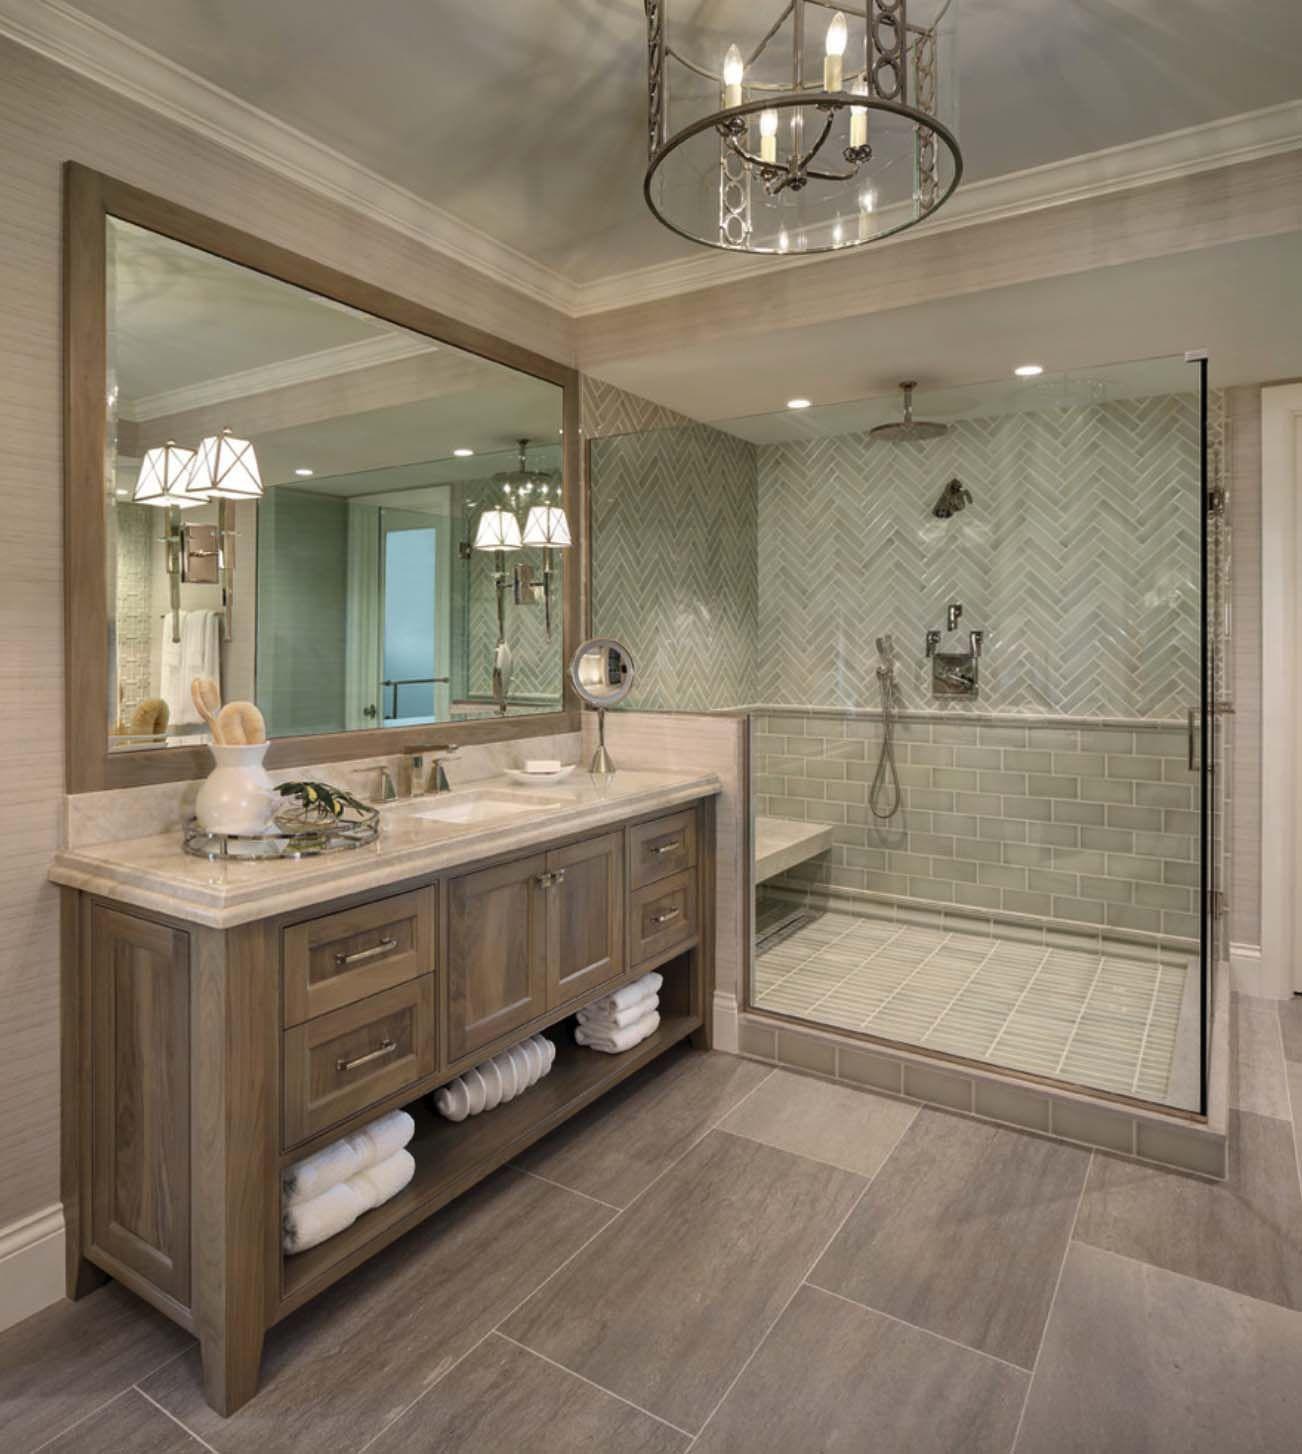 Beach Style Condo Boasts Magnificent Views Of The Gulf Of Mexico Bathroom Interior Design Bathroom Design Bathrooms Remodel